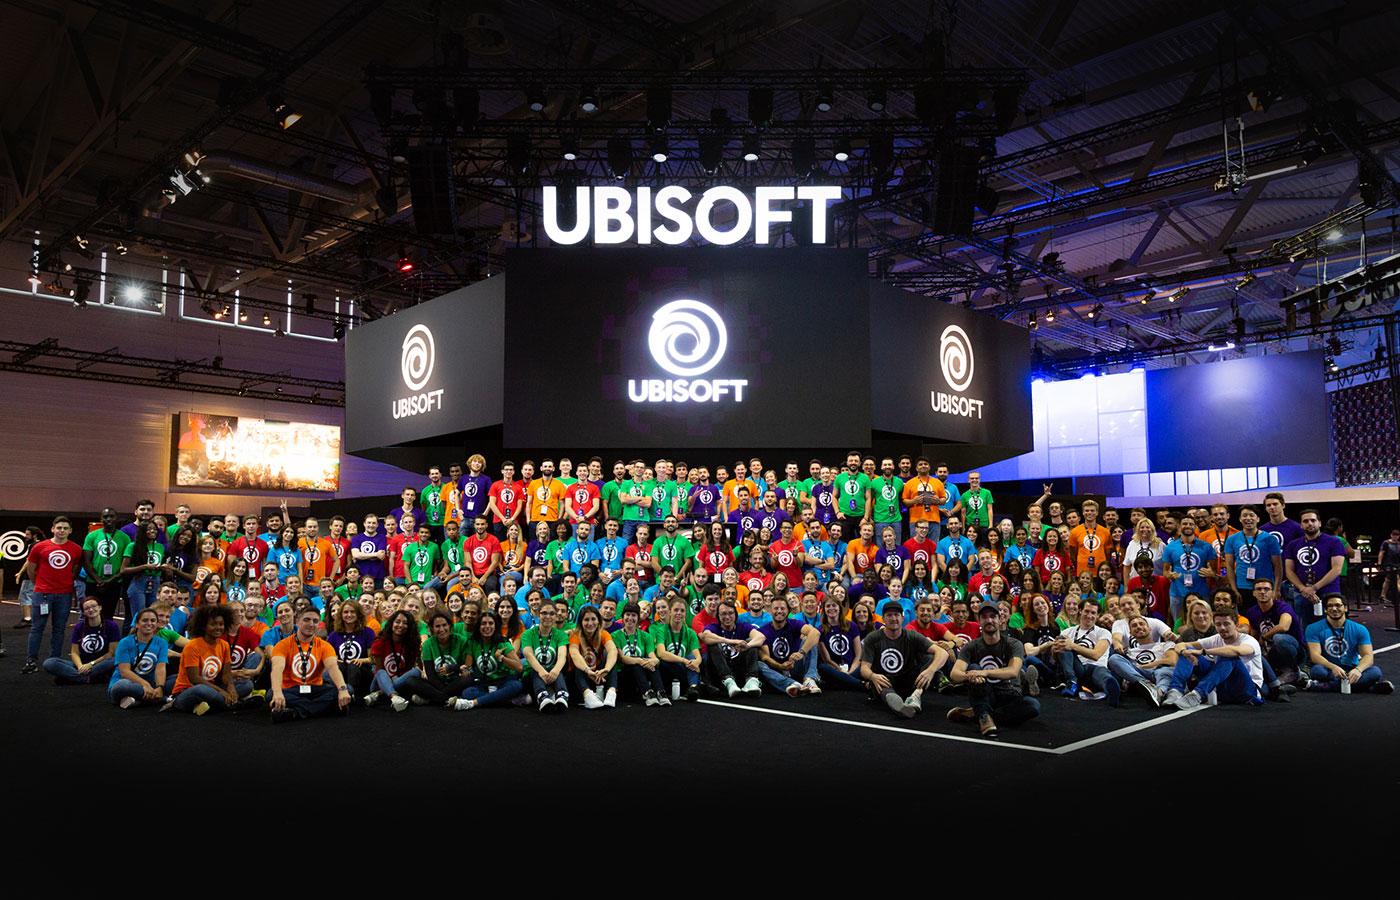 Ubisoft – Gamescom 2018